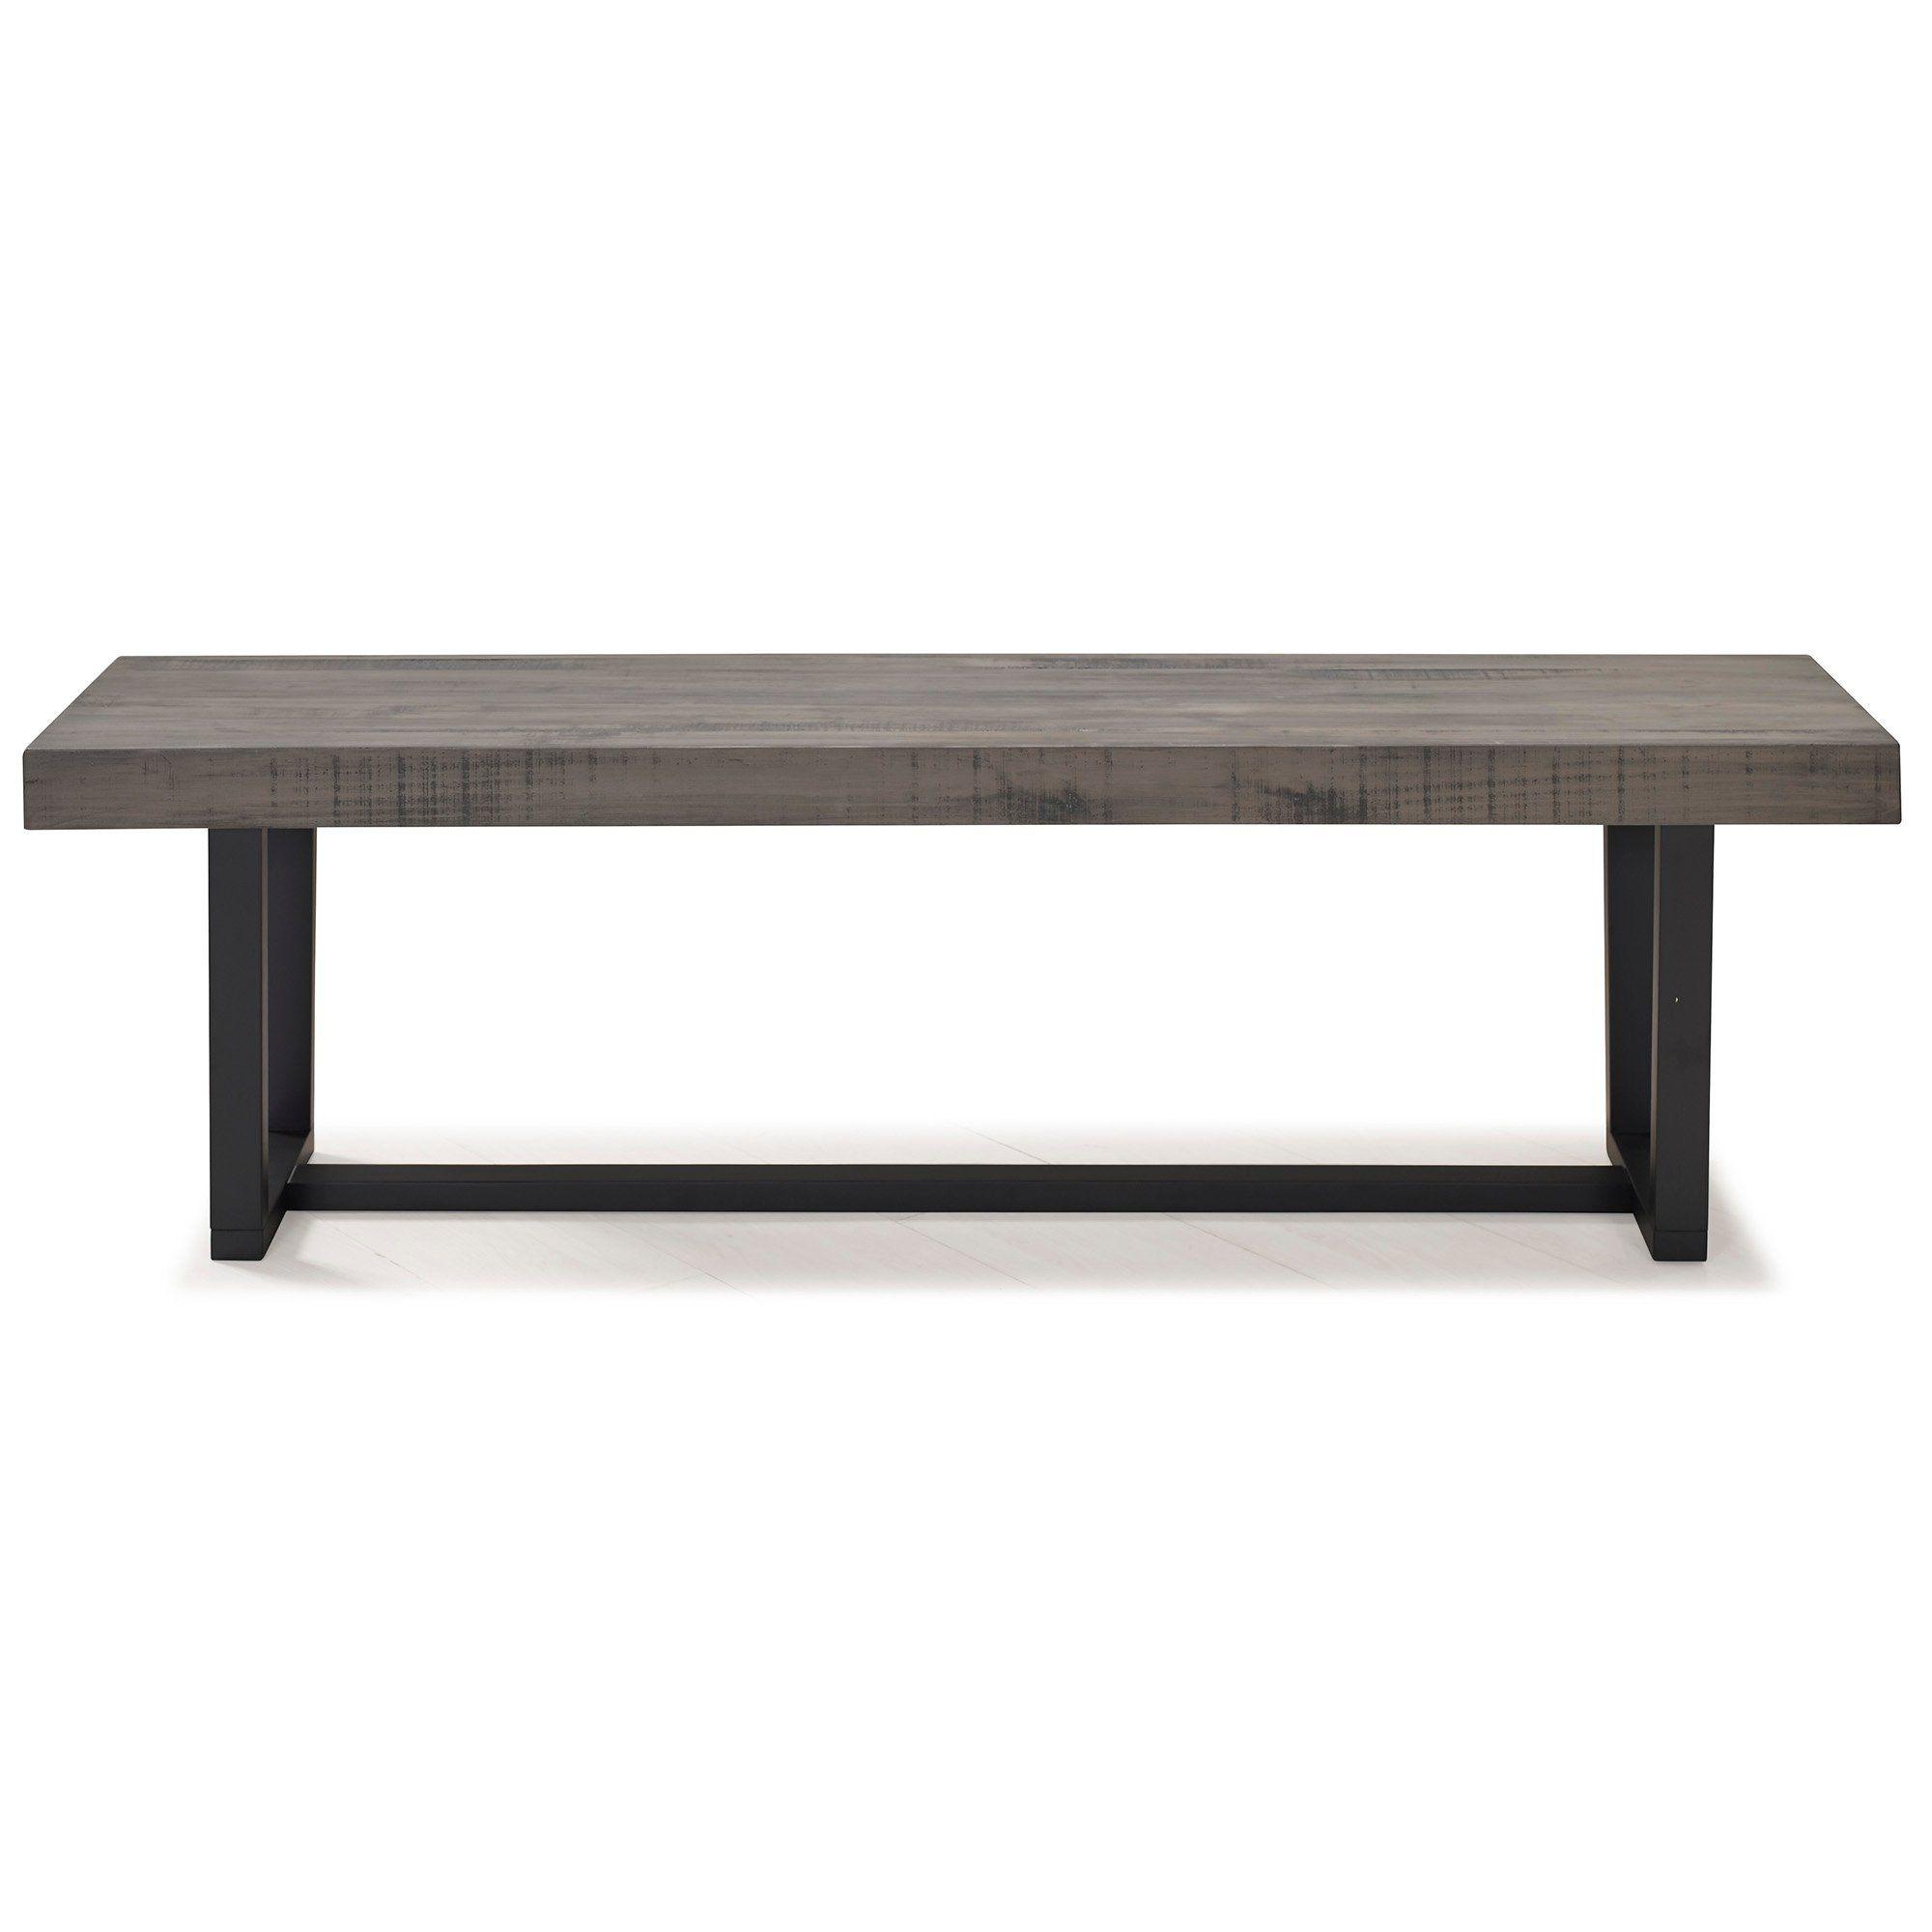 Gray 60 Inch Dining Room Bench In 2020 Dining Bench Seat Dining Room Bench Dining Bench